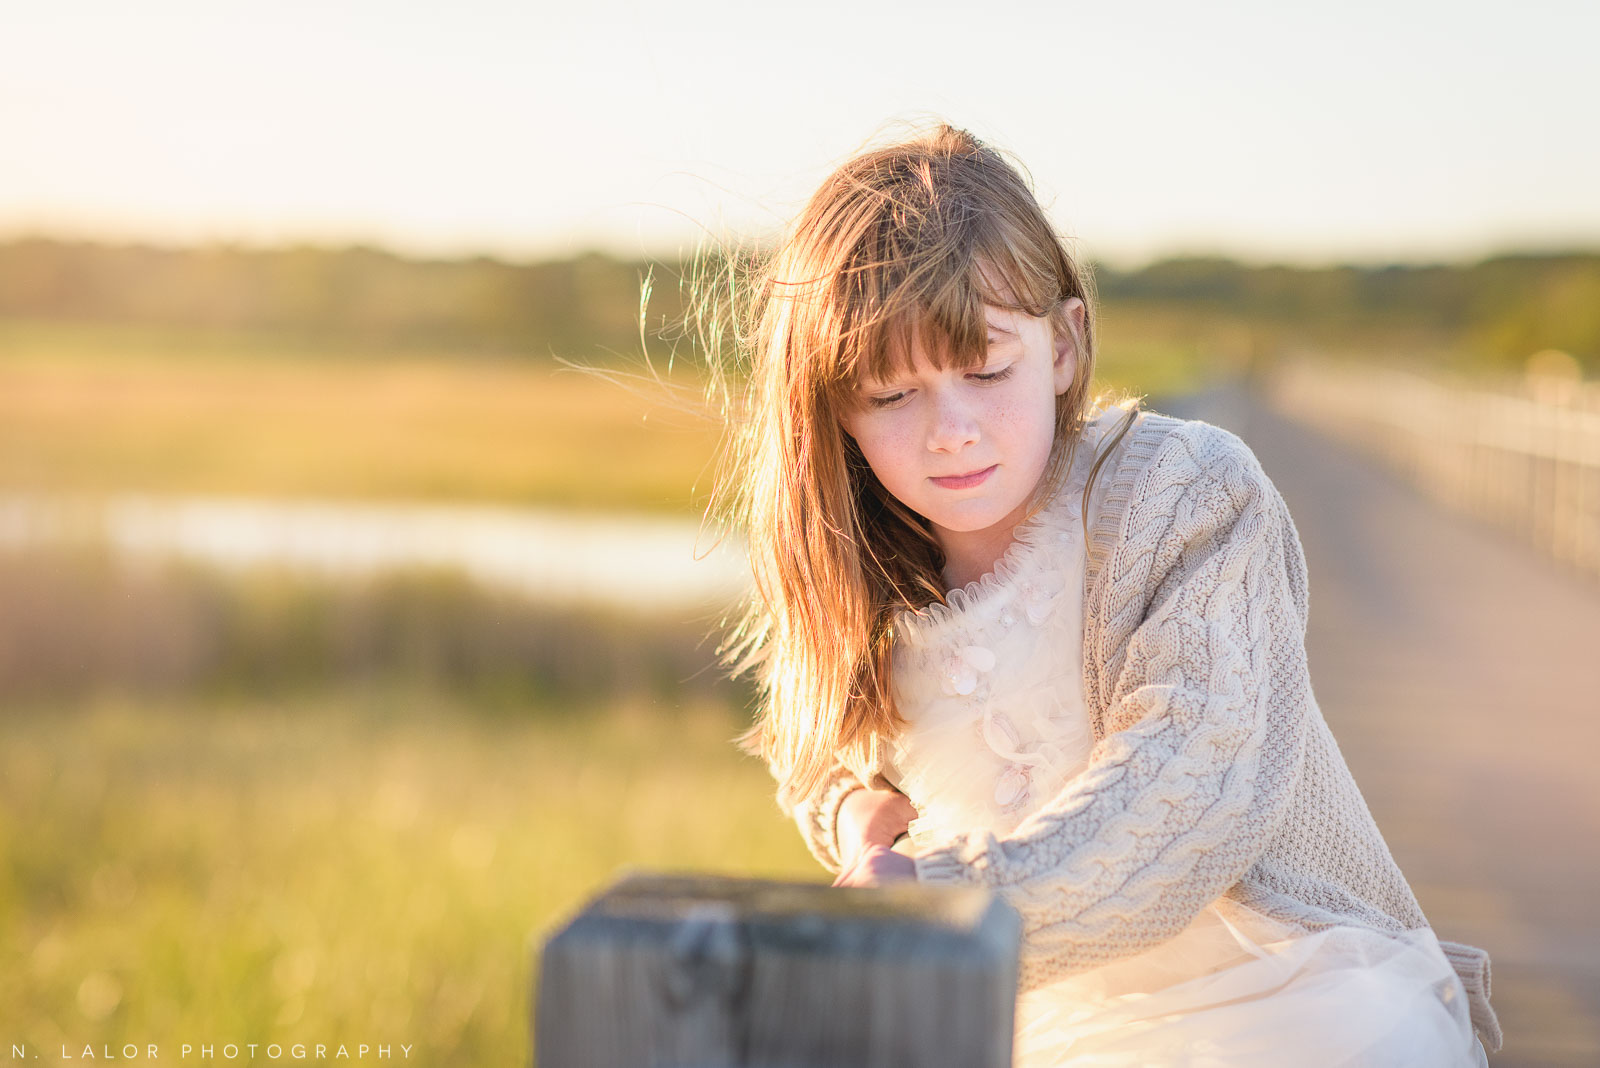 nlalor-photography-2015-10-04-gwen-beach-session-12.jpg